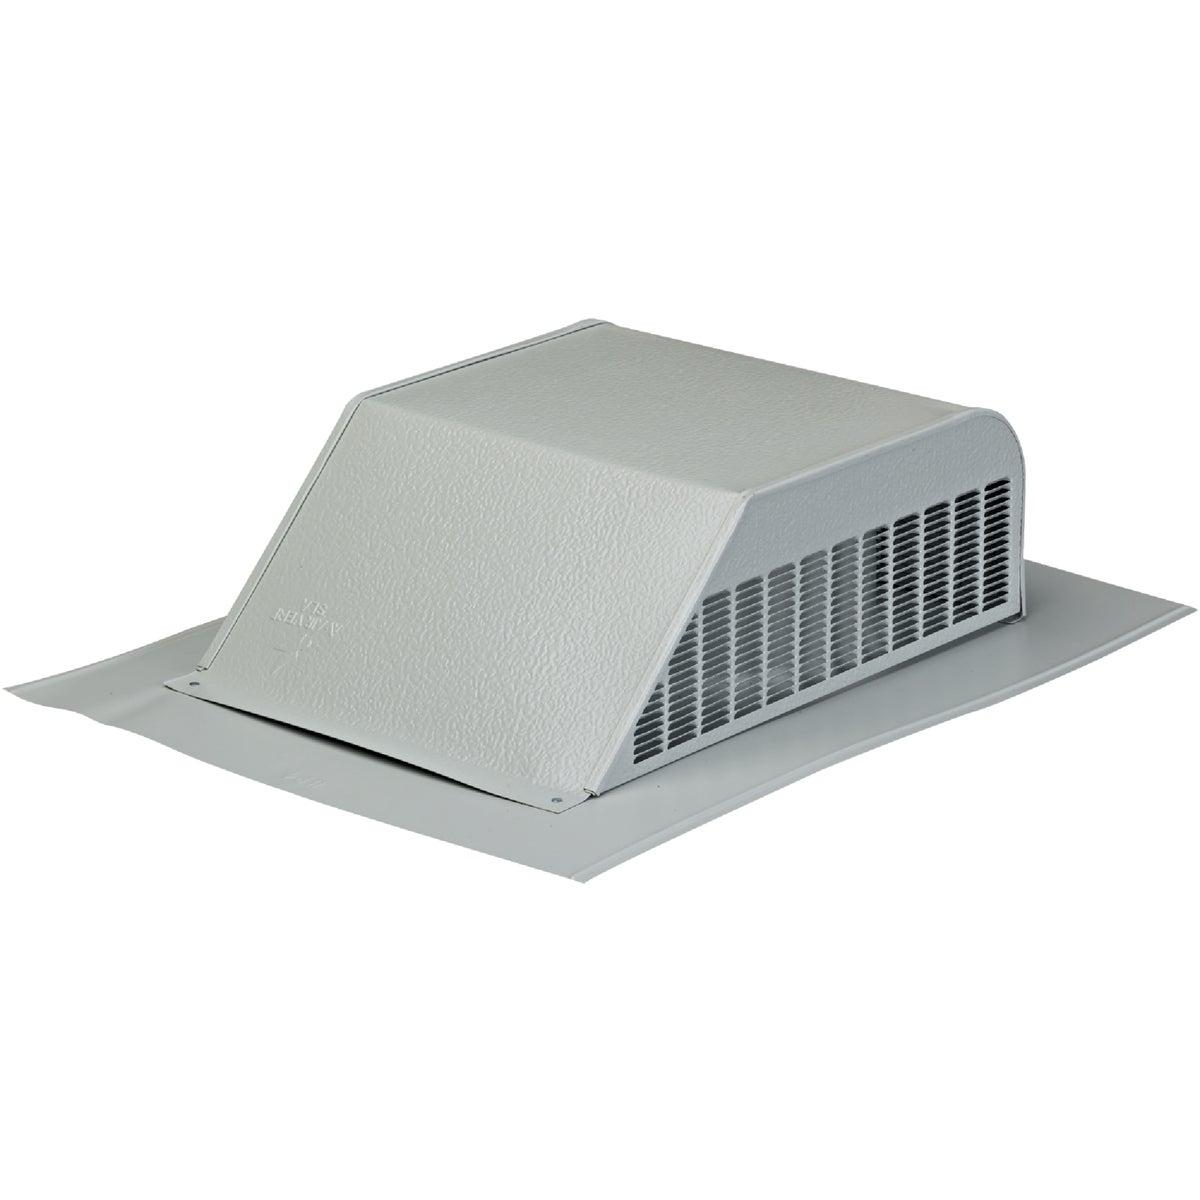 Airhawk 50 In. Aluminum Slant Back Roof Vent, 85281